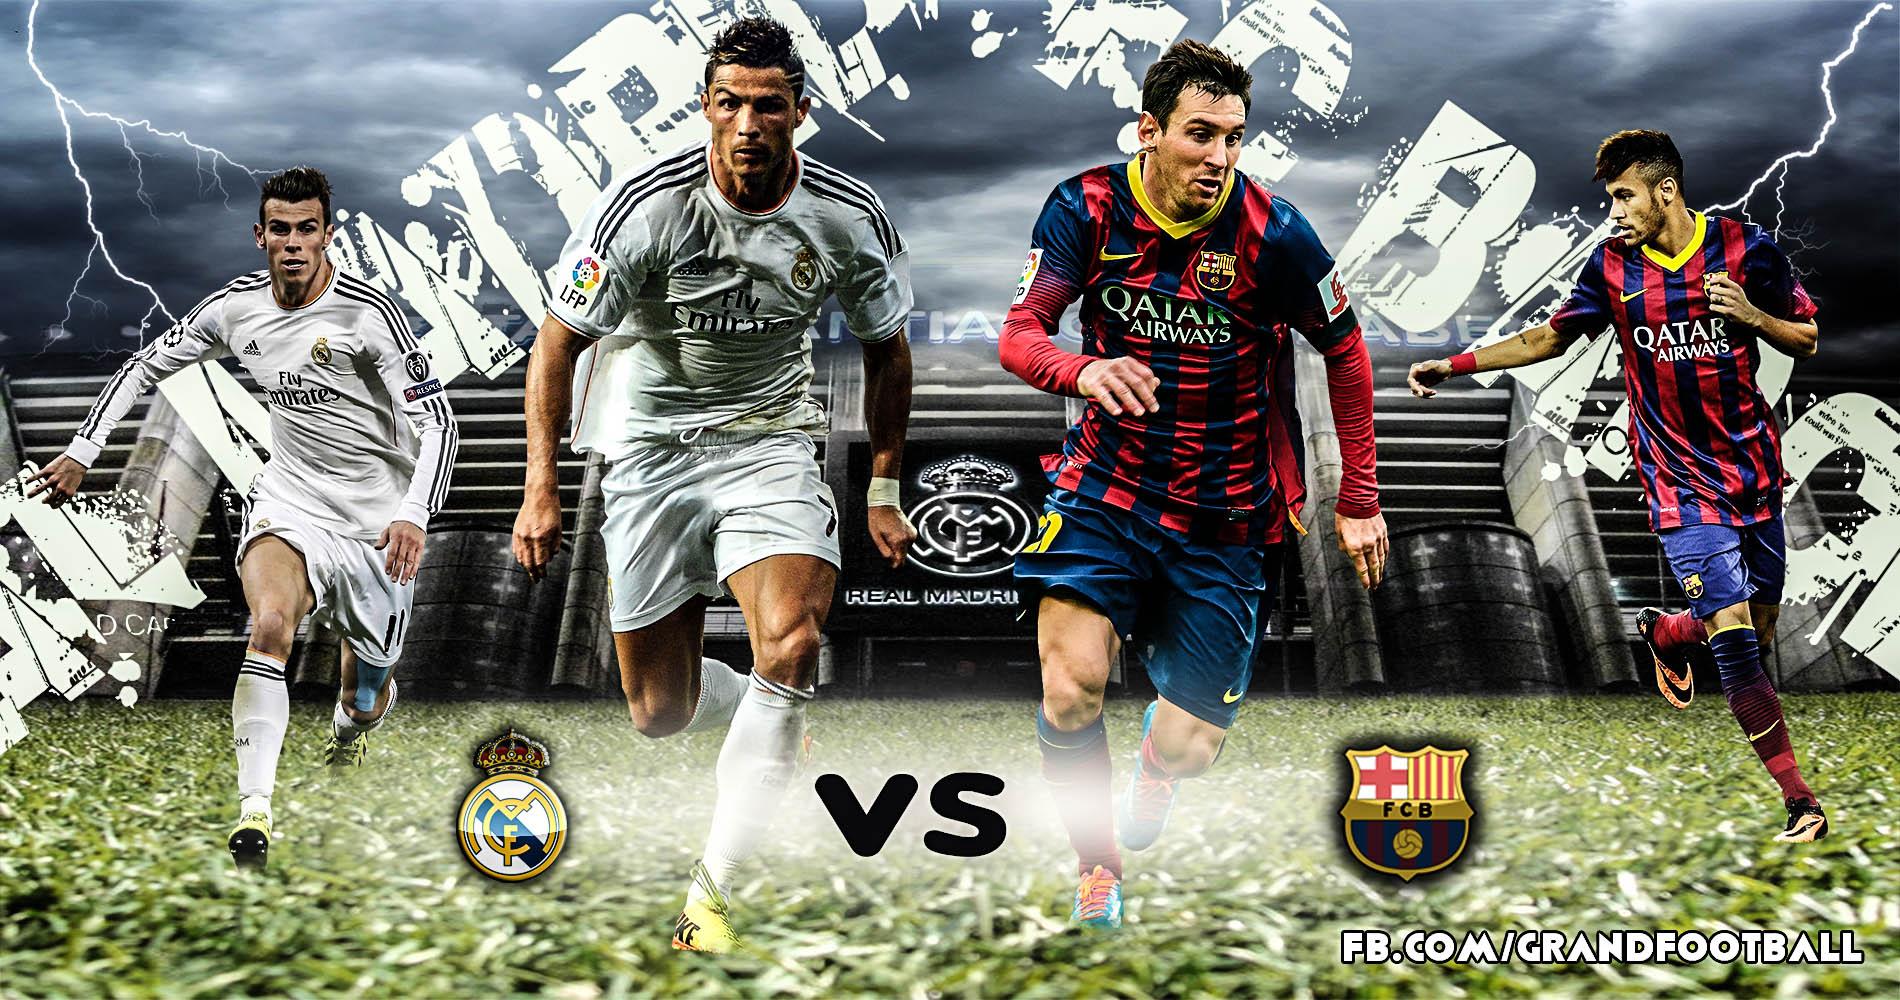 http://orig10.deviantart.net/fa4f/f/2014/080/9/c/real_madrid_vs_fc_barcelona_by_lionelkhouya-d7b308x.jpg